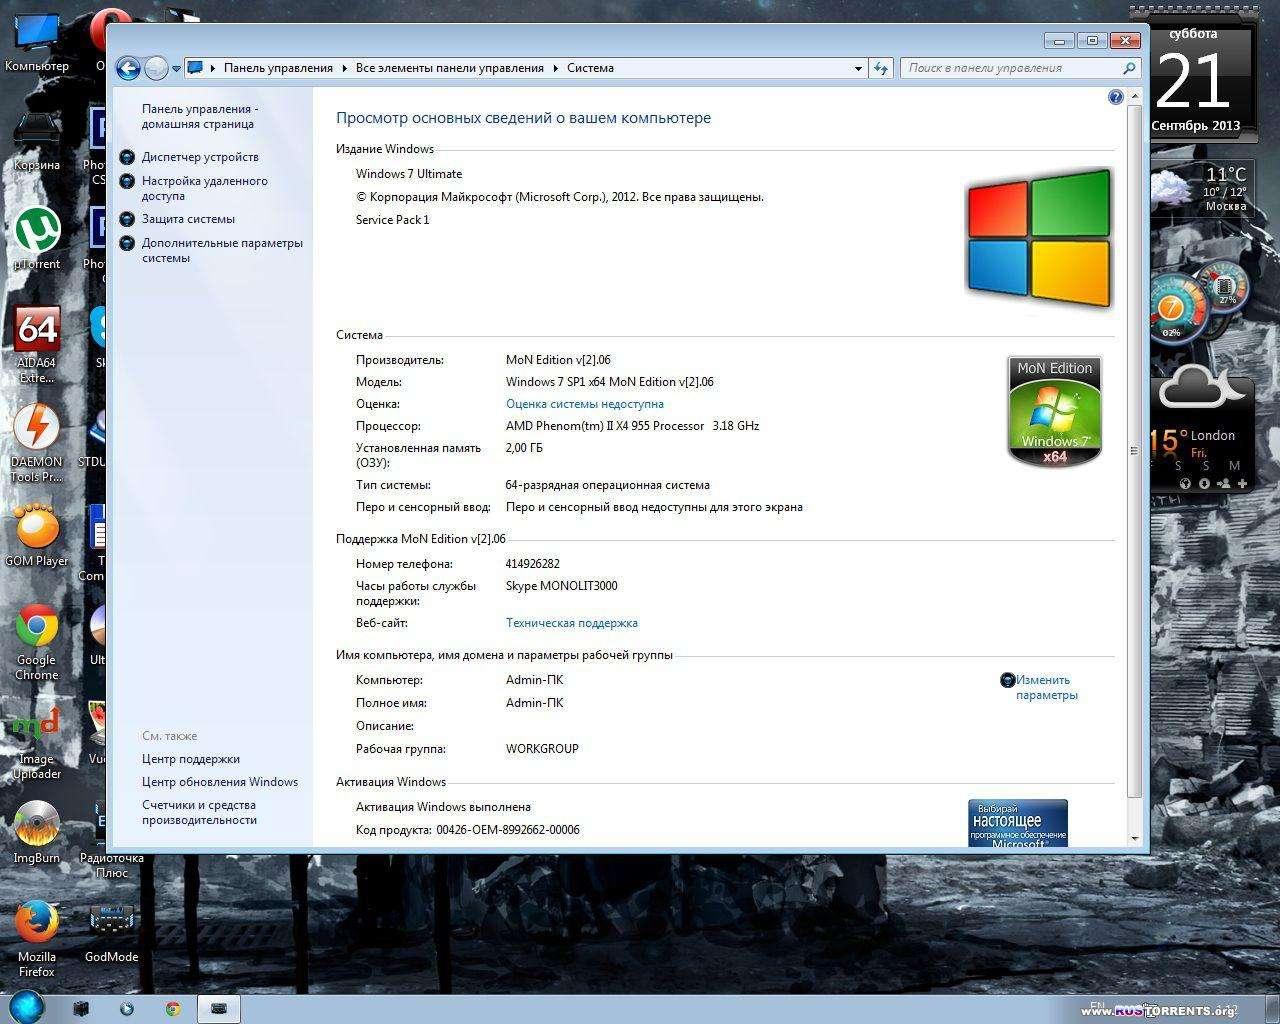 Windows 7 SP1 Ultimate MoN Edition x86/x64 2.06 +WinPE+WPI RUS